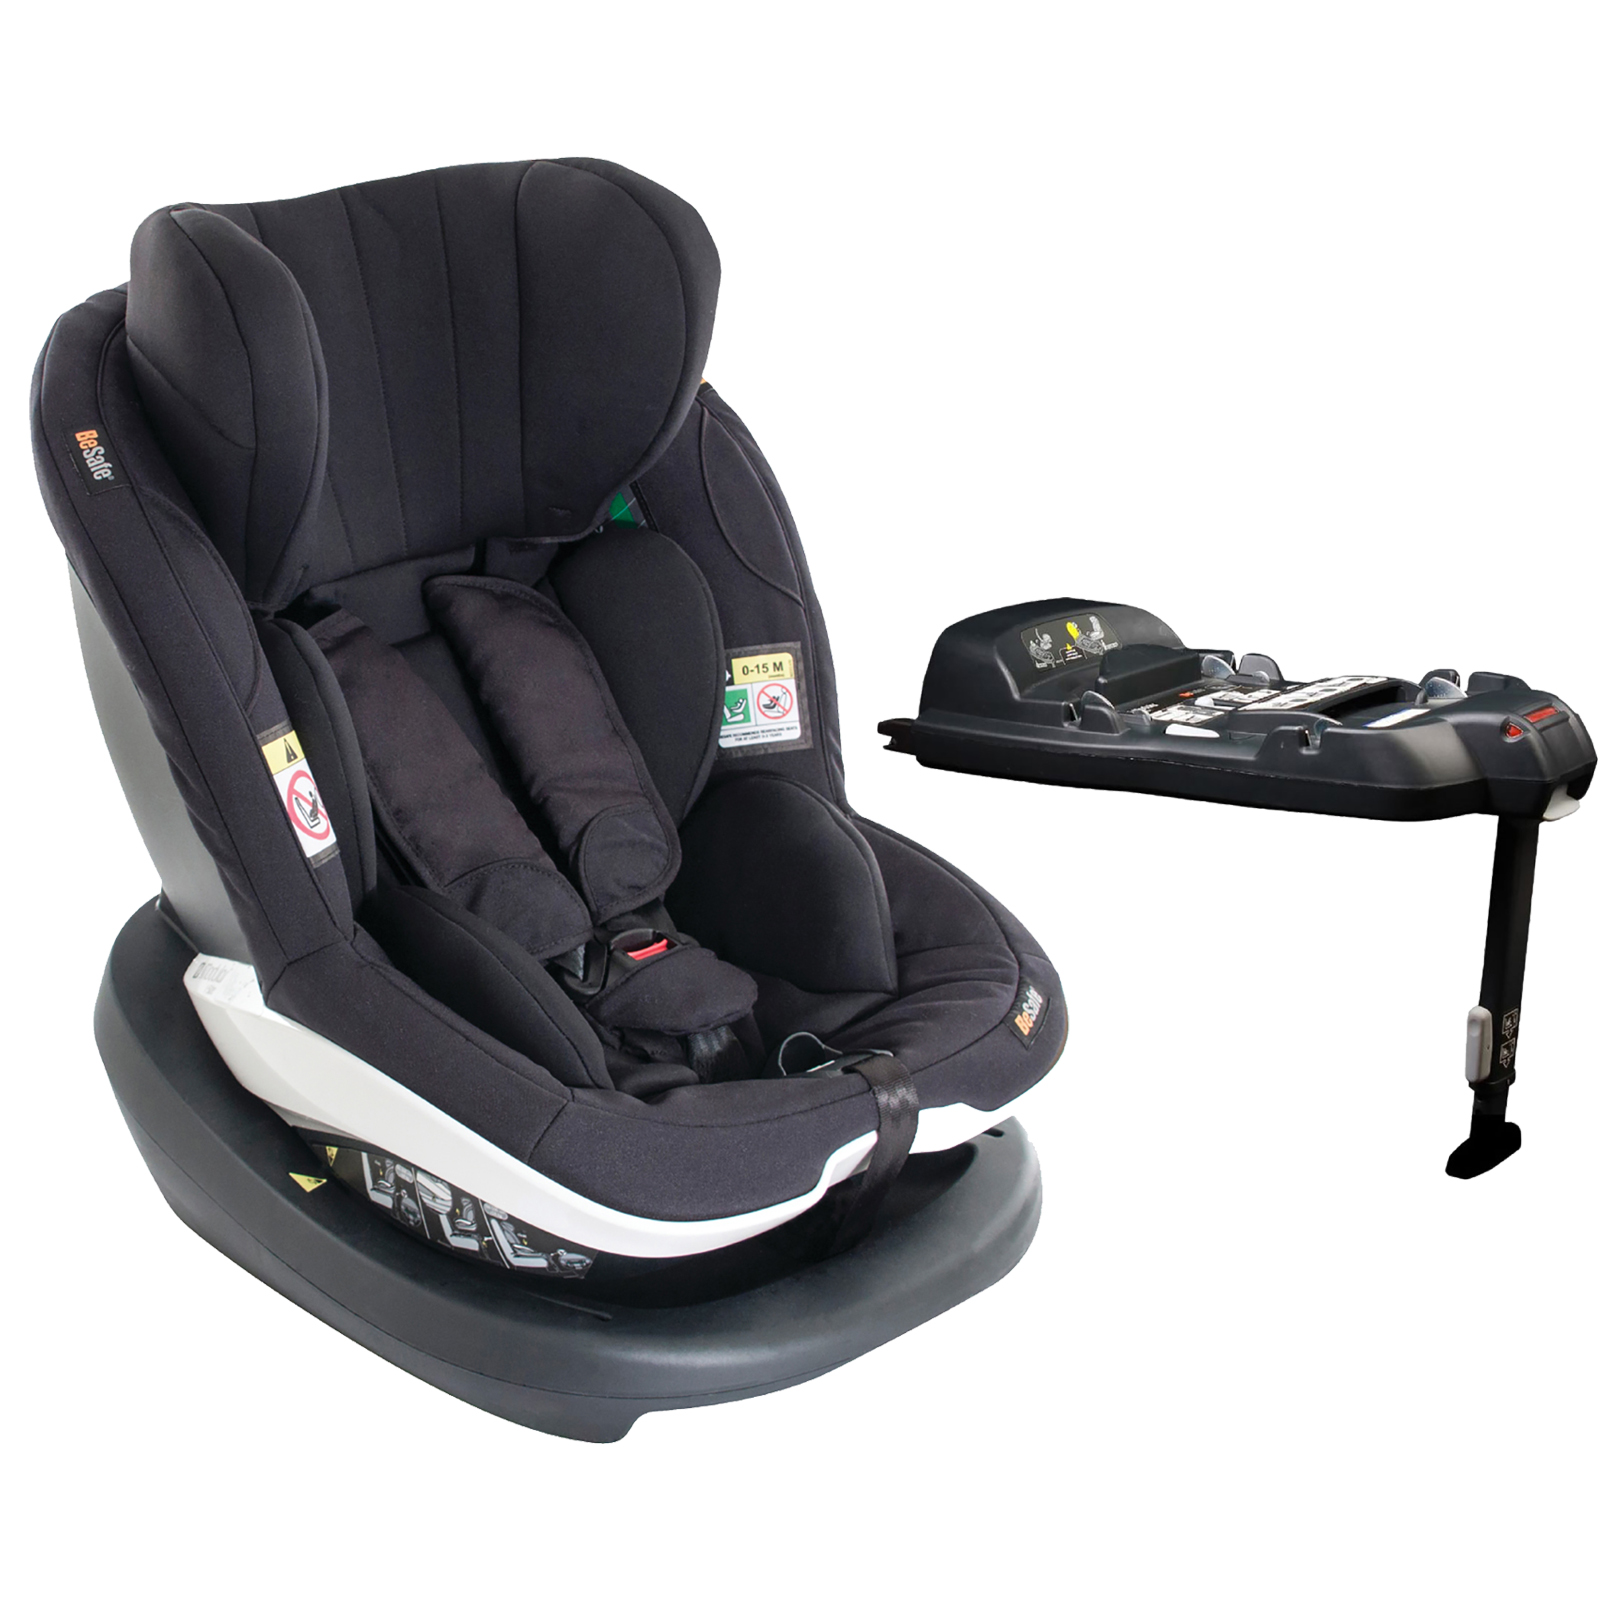 besafe izi modular i size car seat isofix base black. Black Bedroom Furniture Sets. Home Design Ideas